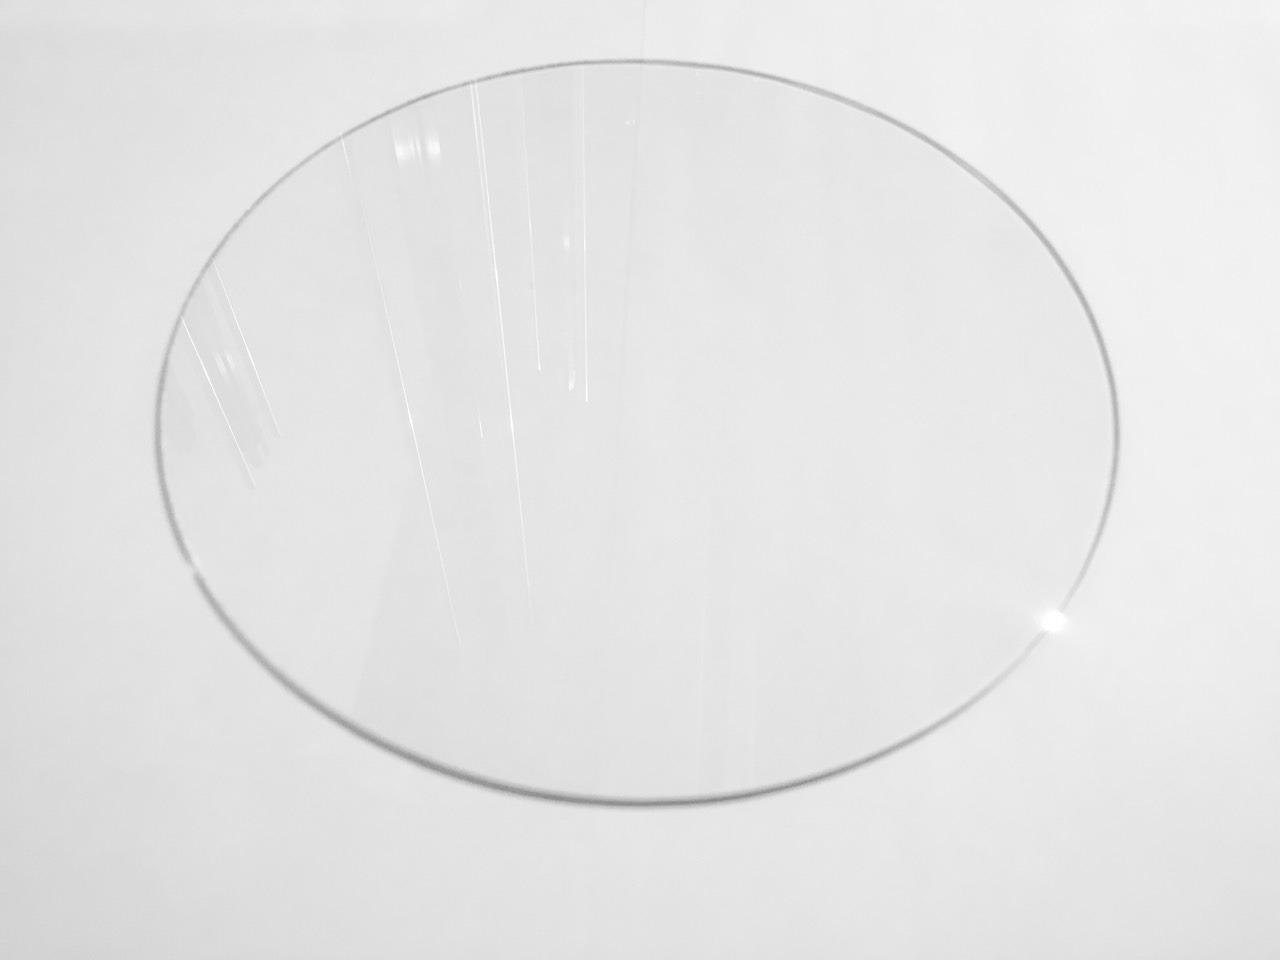 Trino用 プリントガラス - 画像1